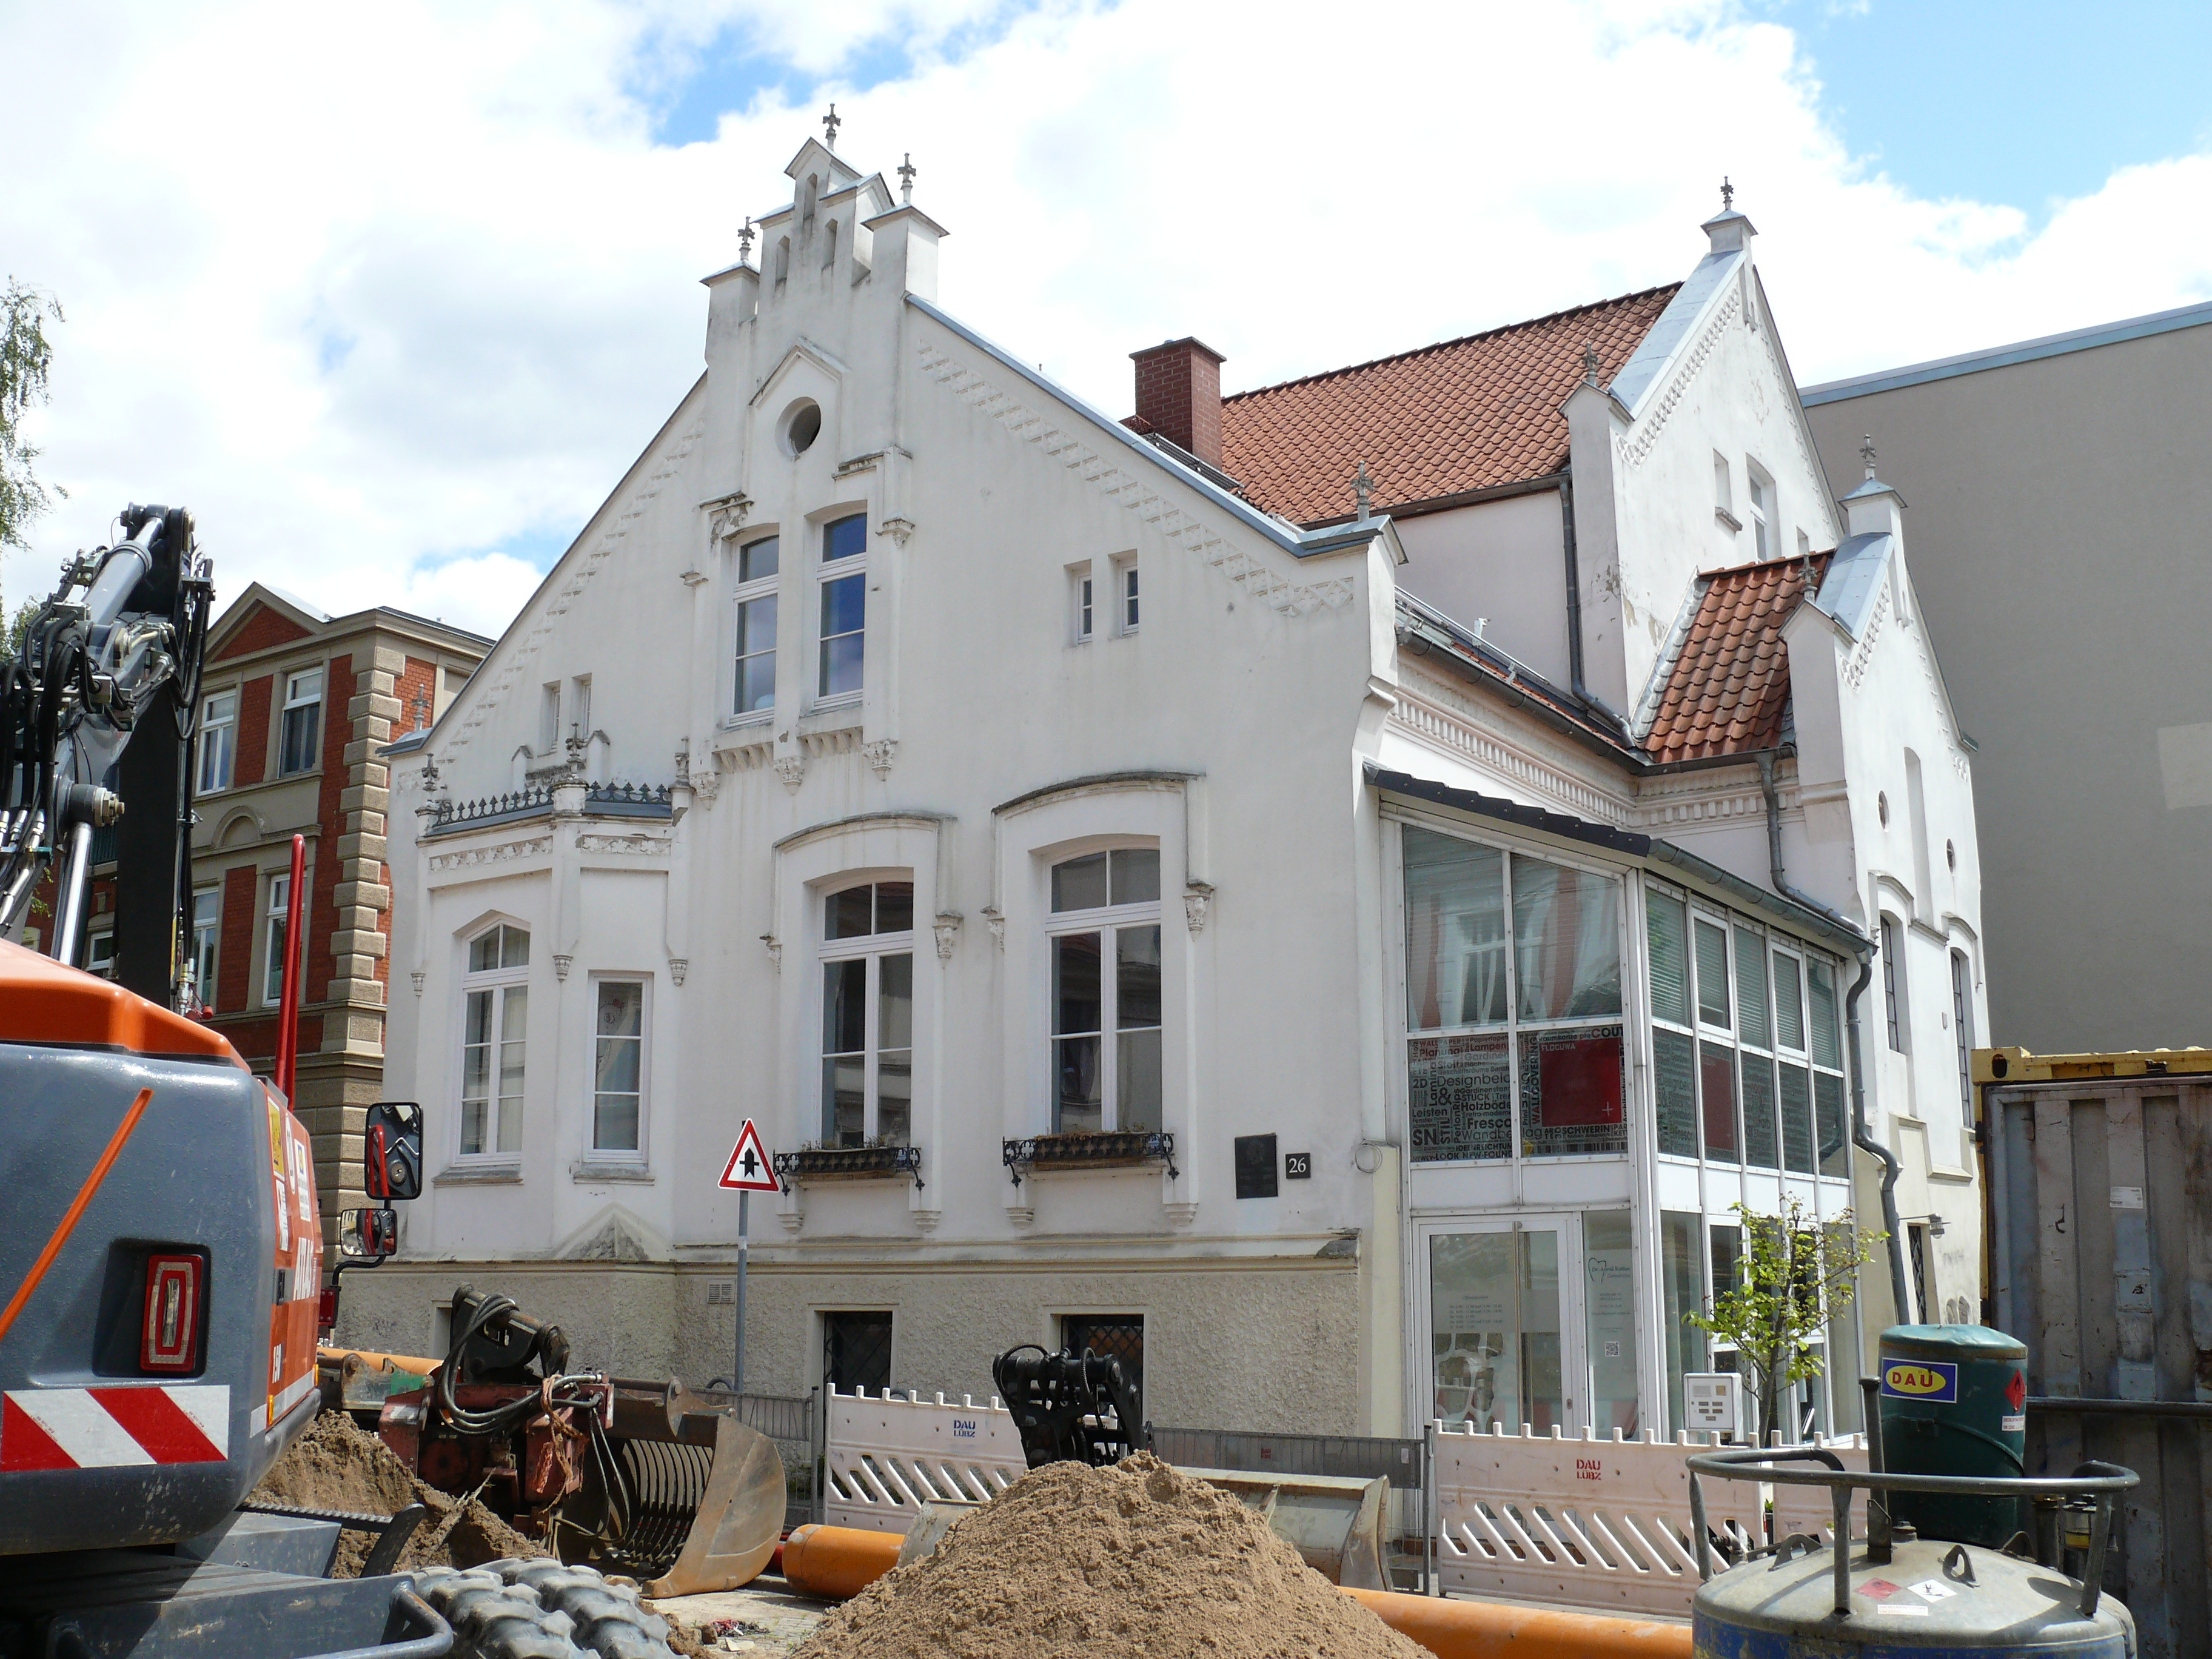 File:Schelfstraße26 Schwerin.   Wikimedia Commons